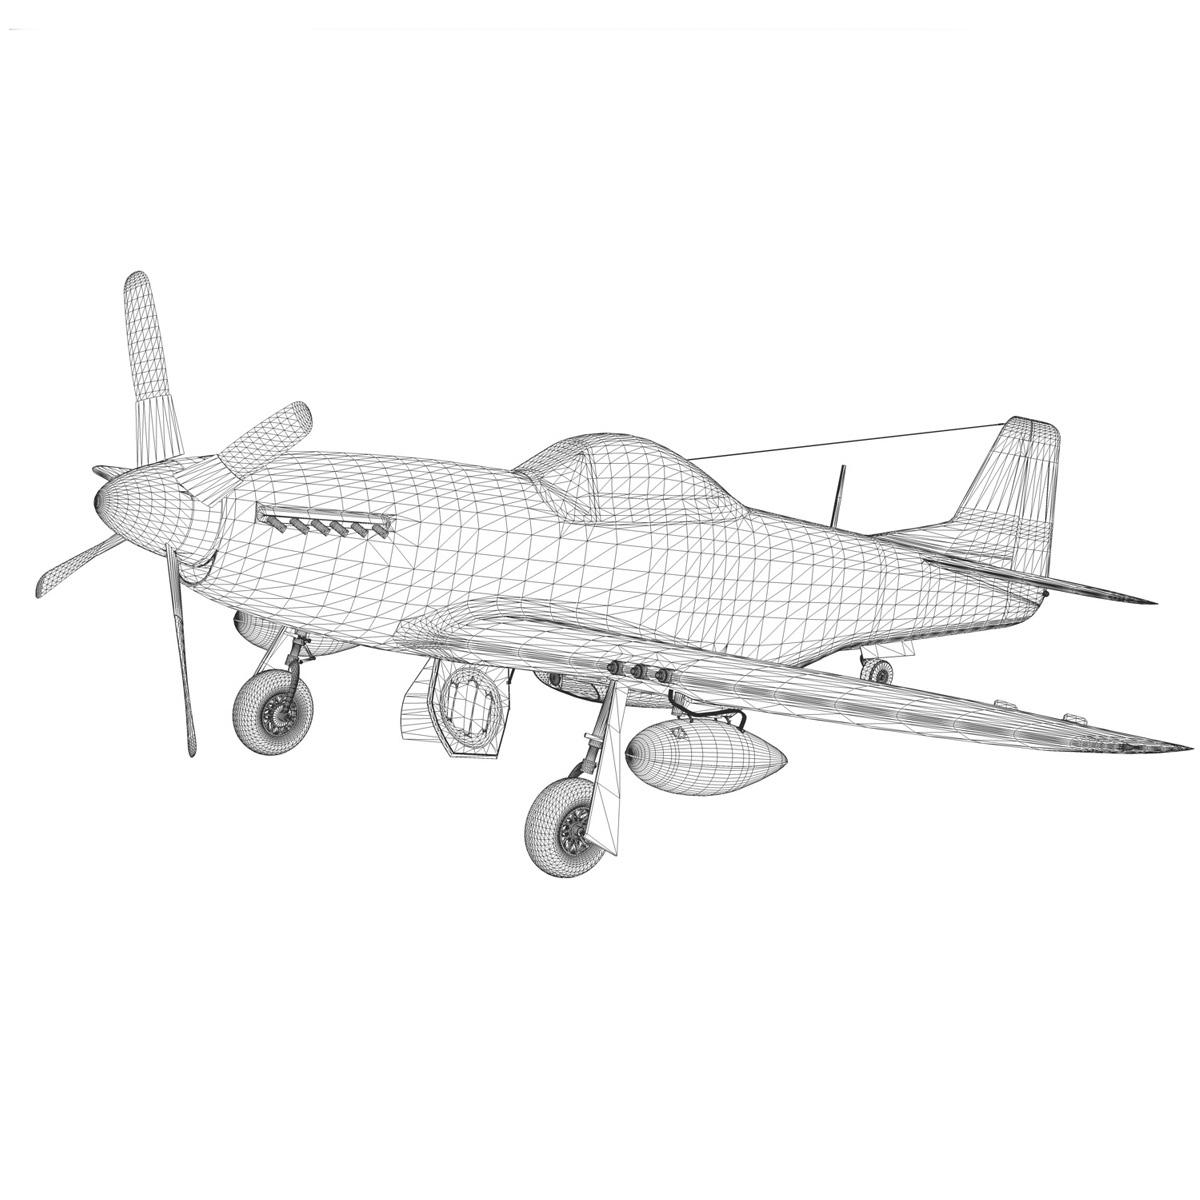 north american p-51d mustang – ferocious frankie 3d model fbx c4d lwo obj 269504